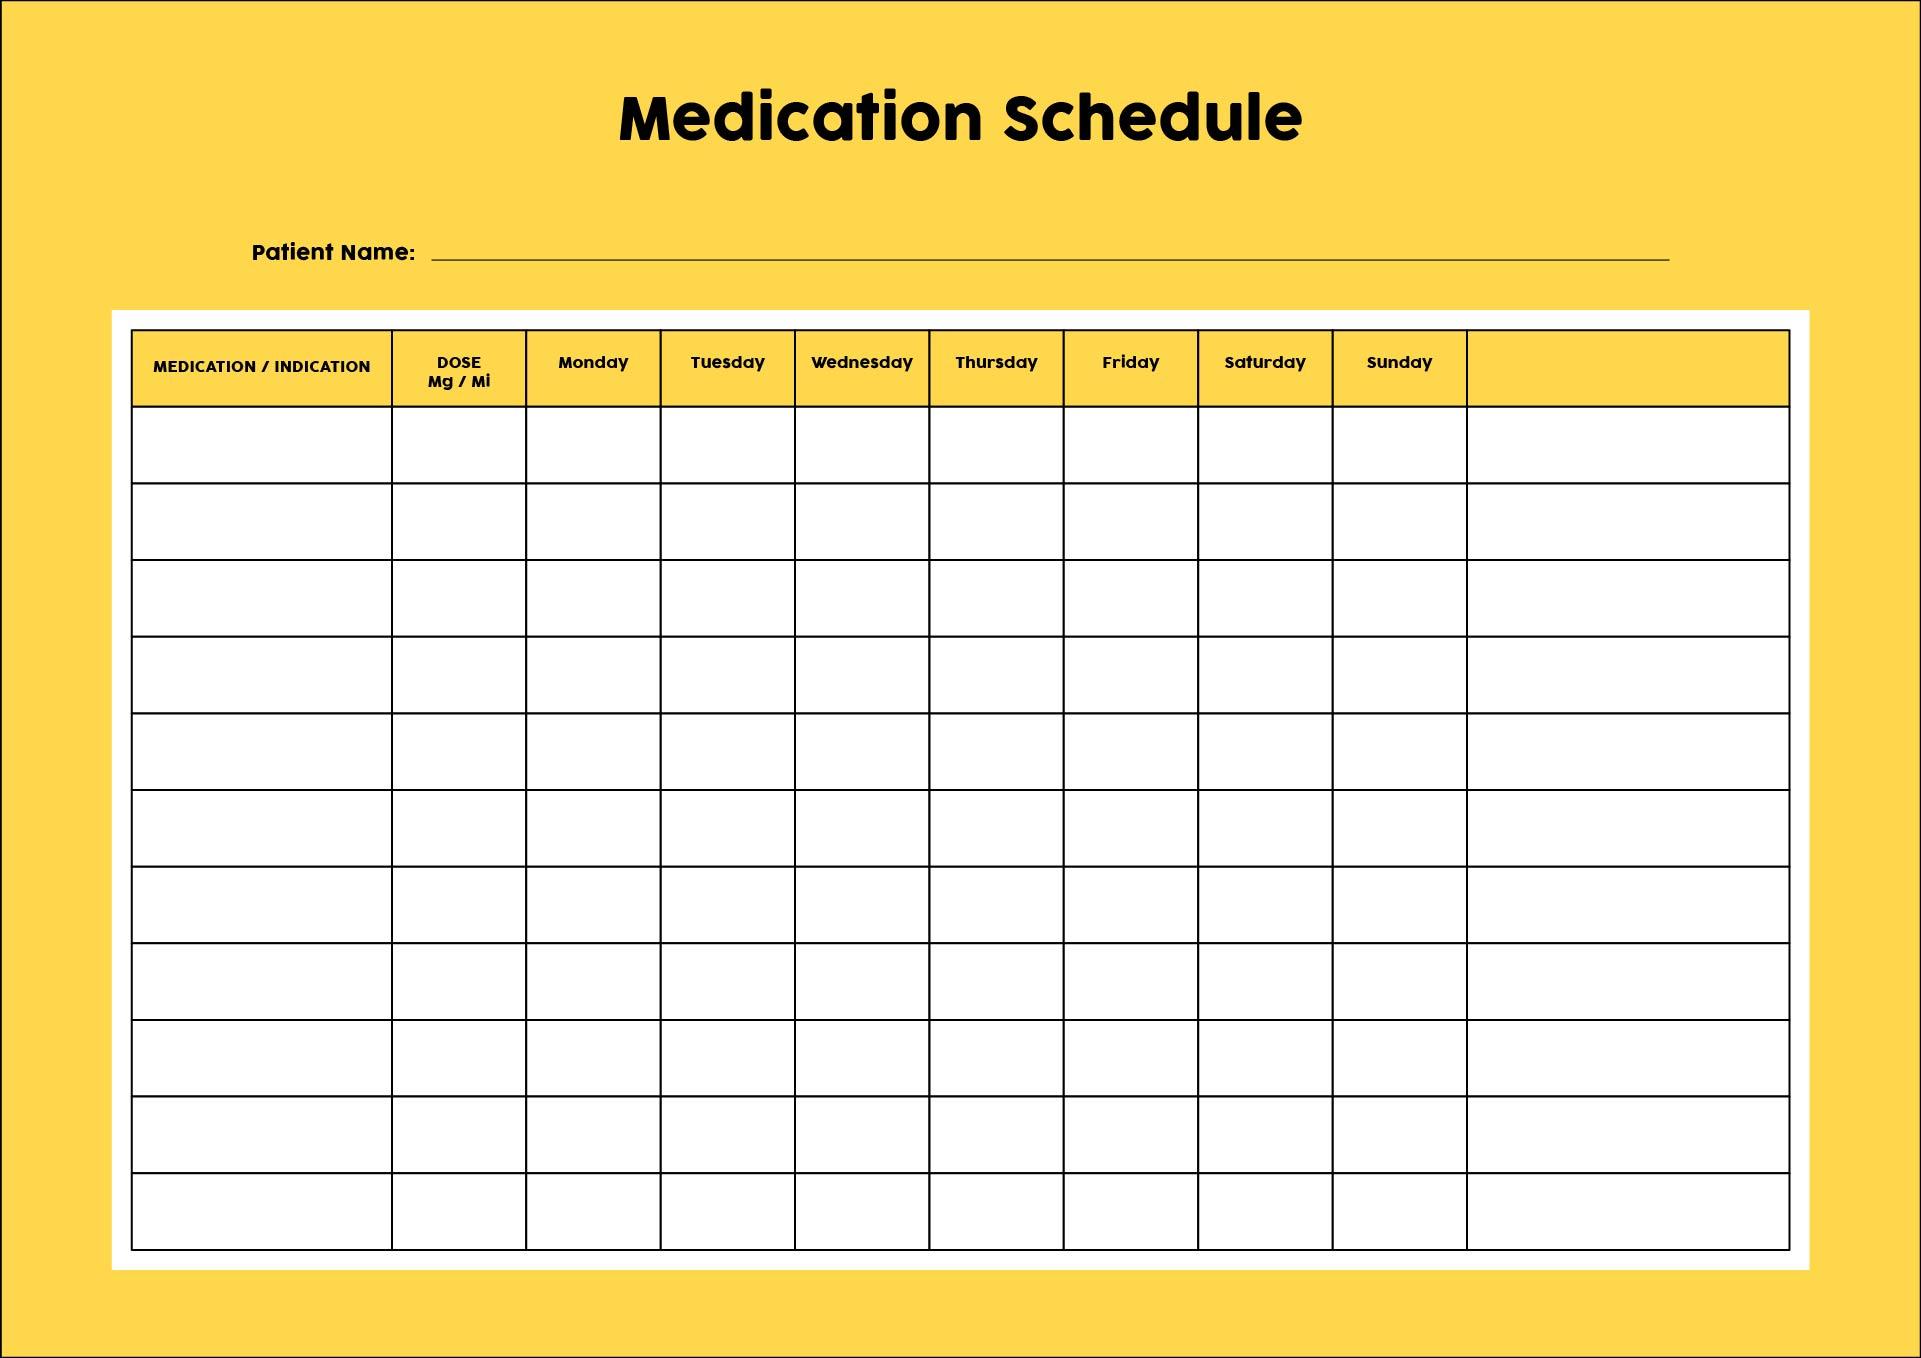 Daily Medication Log Printable - Daily Medication Log Template, Free ...